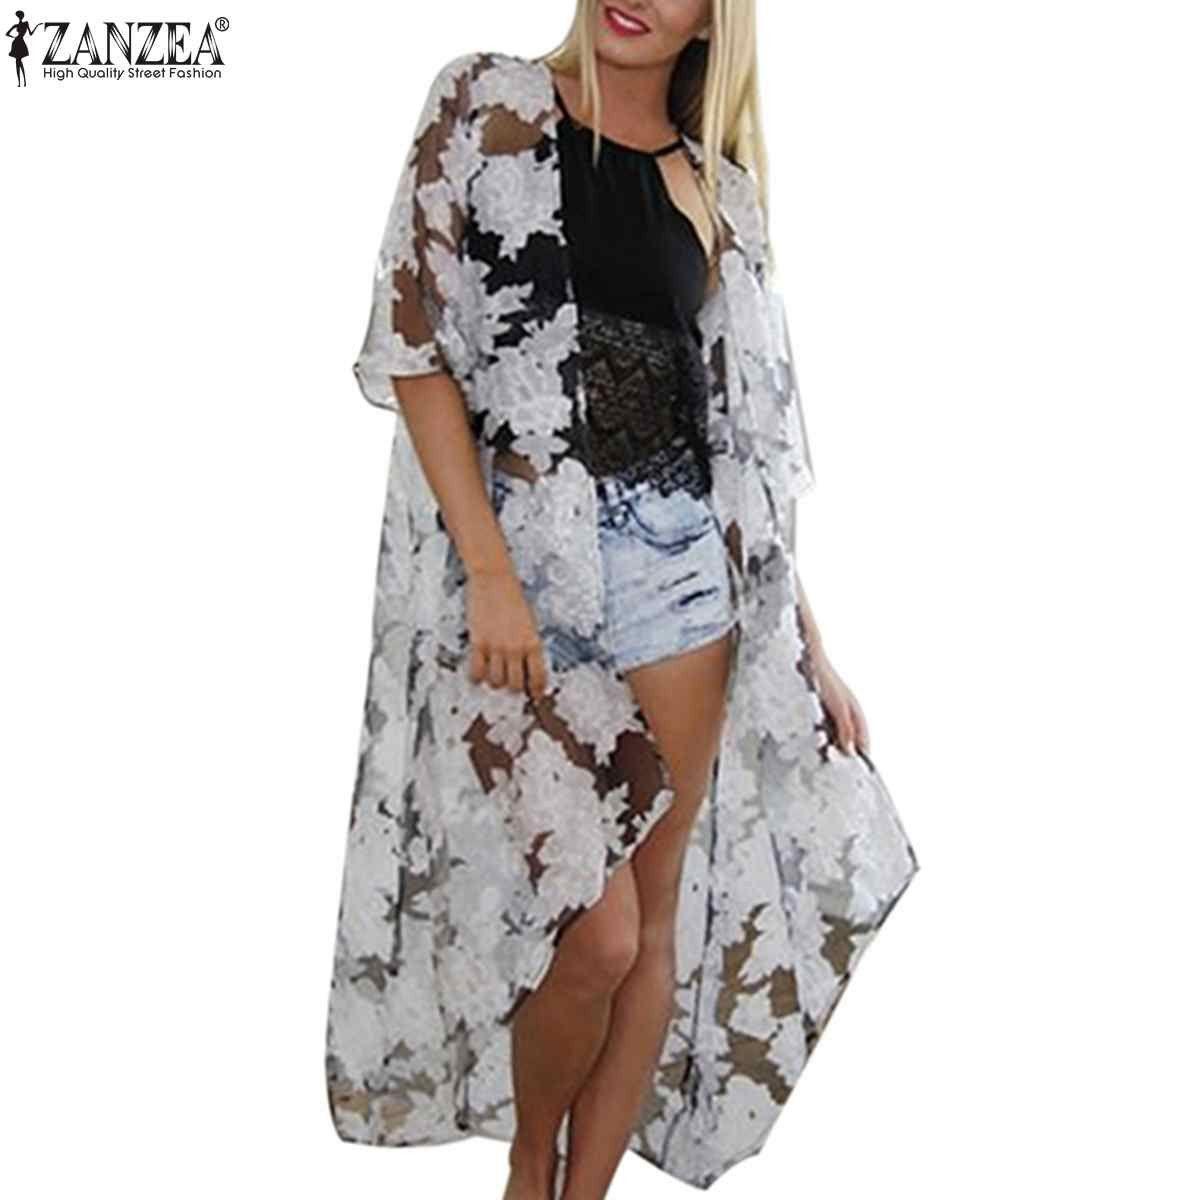 Plus Size S-7XL 2015 Summer Women Zanzea Fashion Beach Cover Up ...